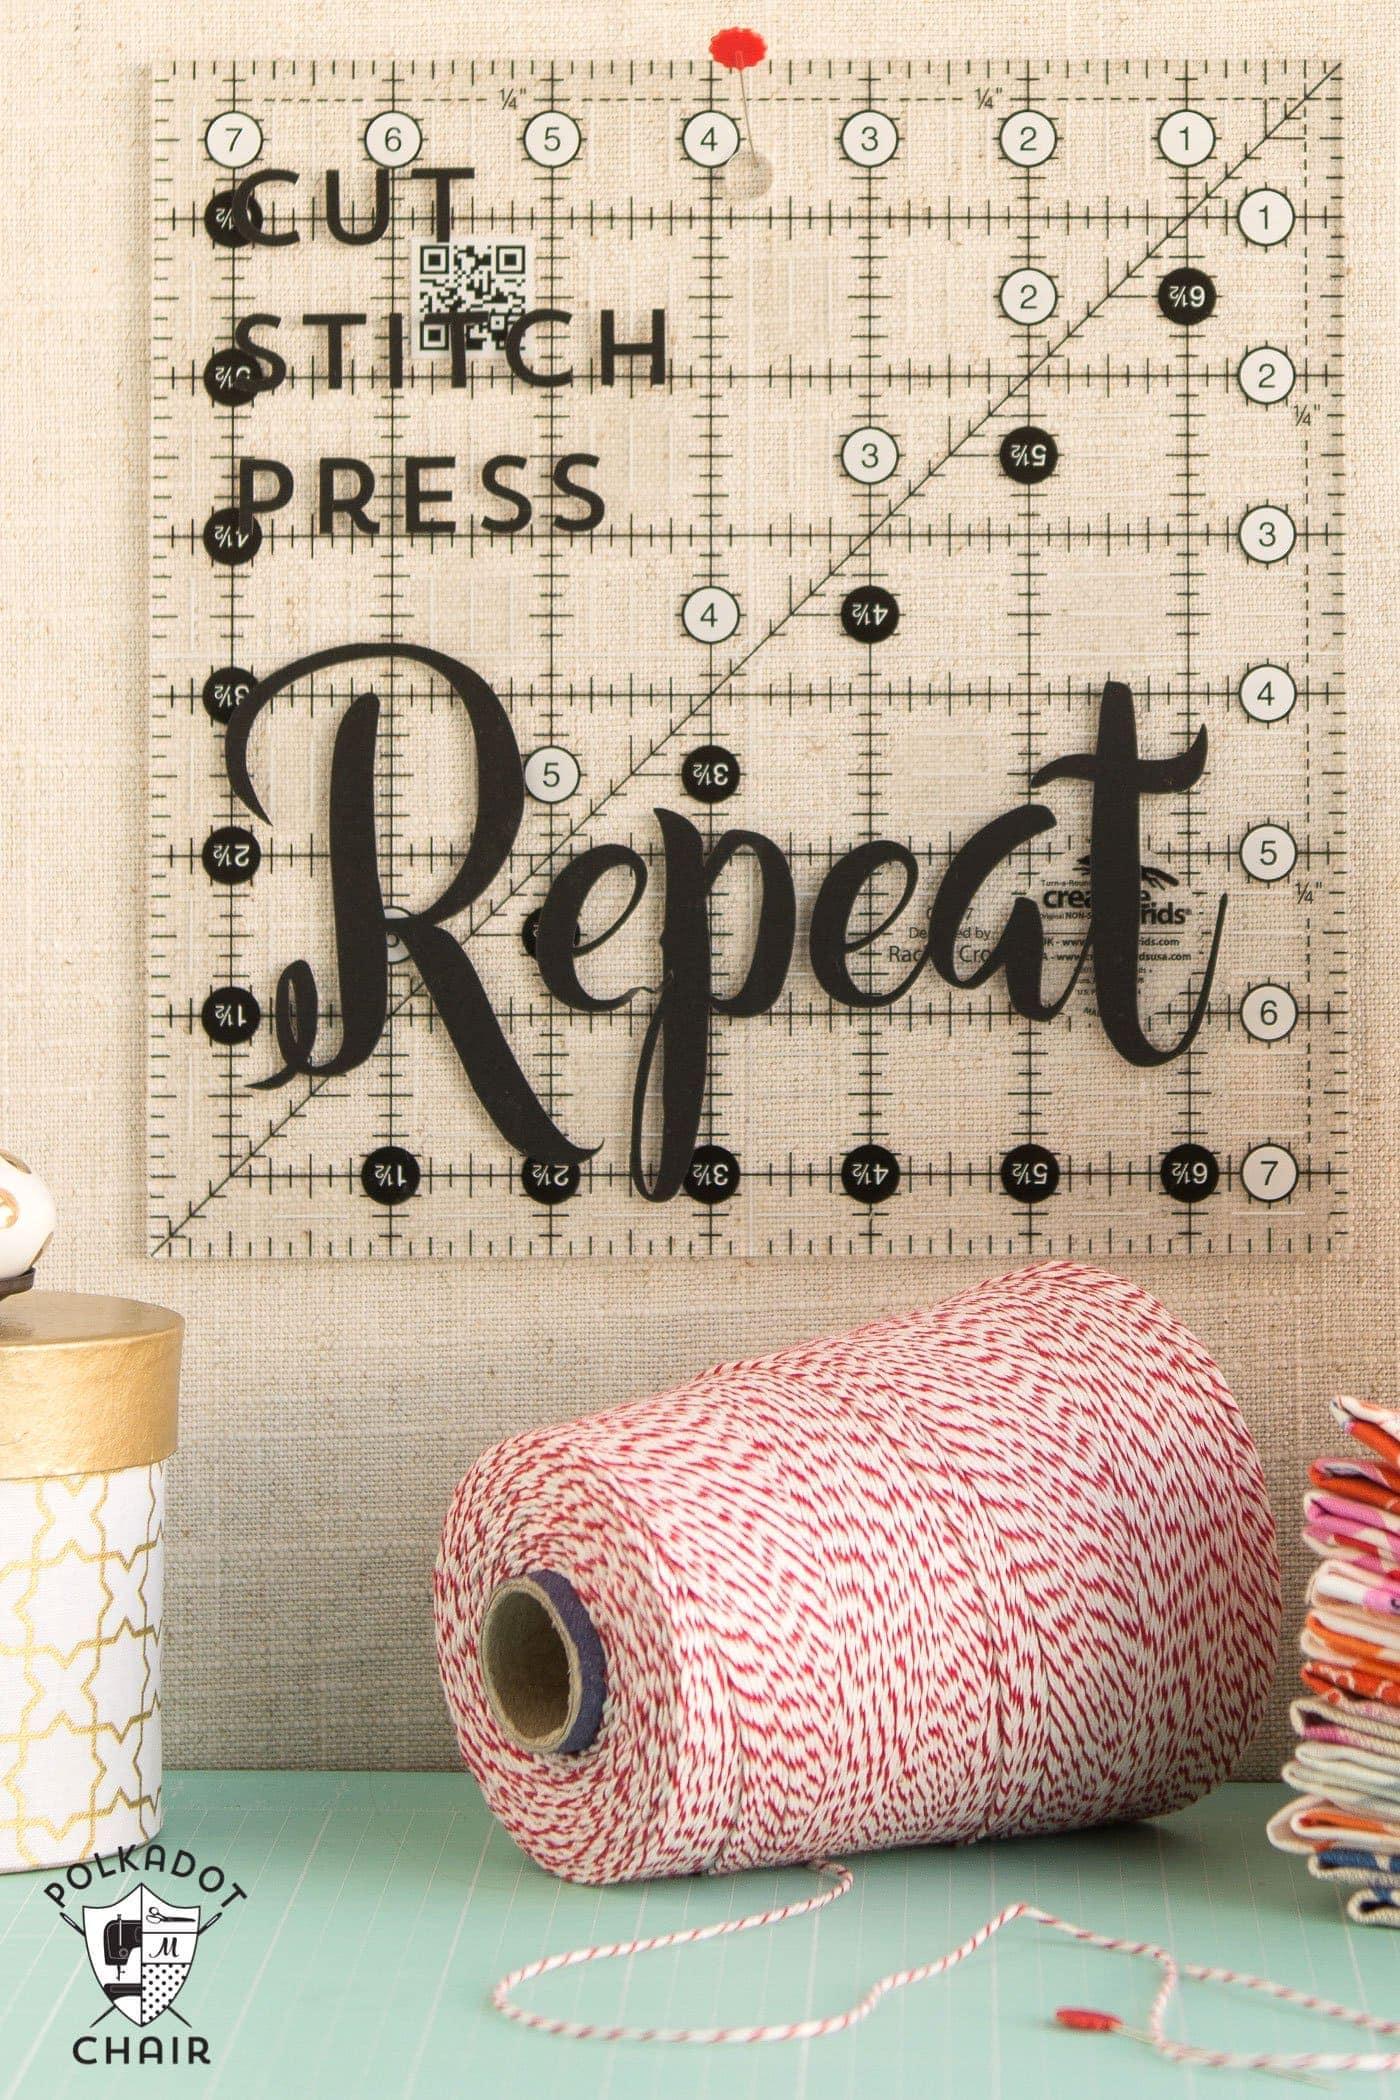 Diy sewing room decor ideas and free cricut cut files for Diy room decor 2016